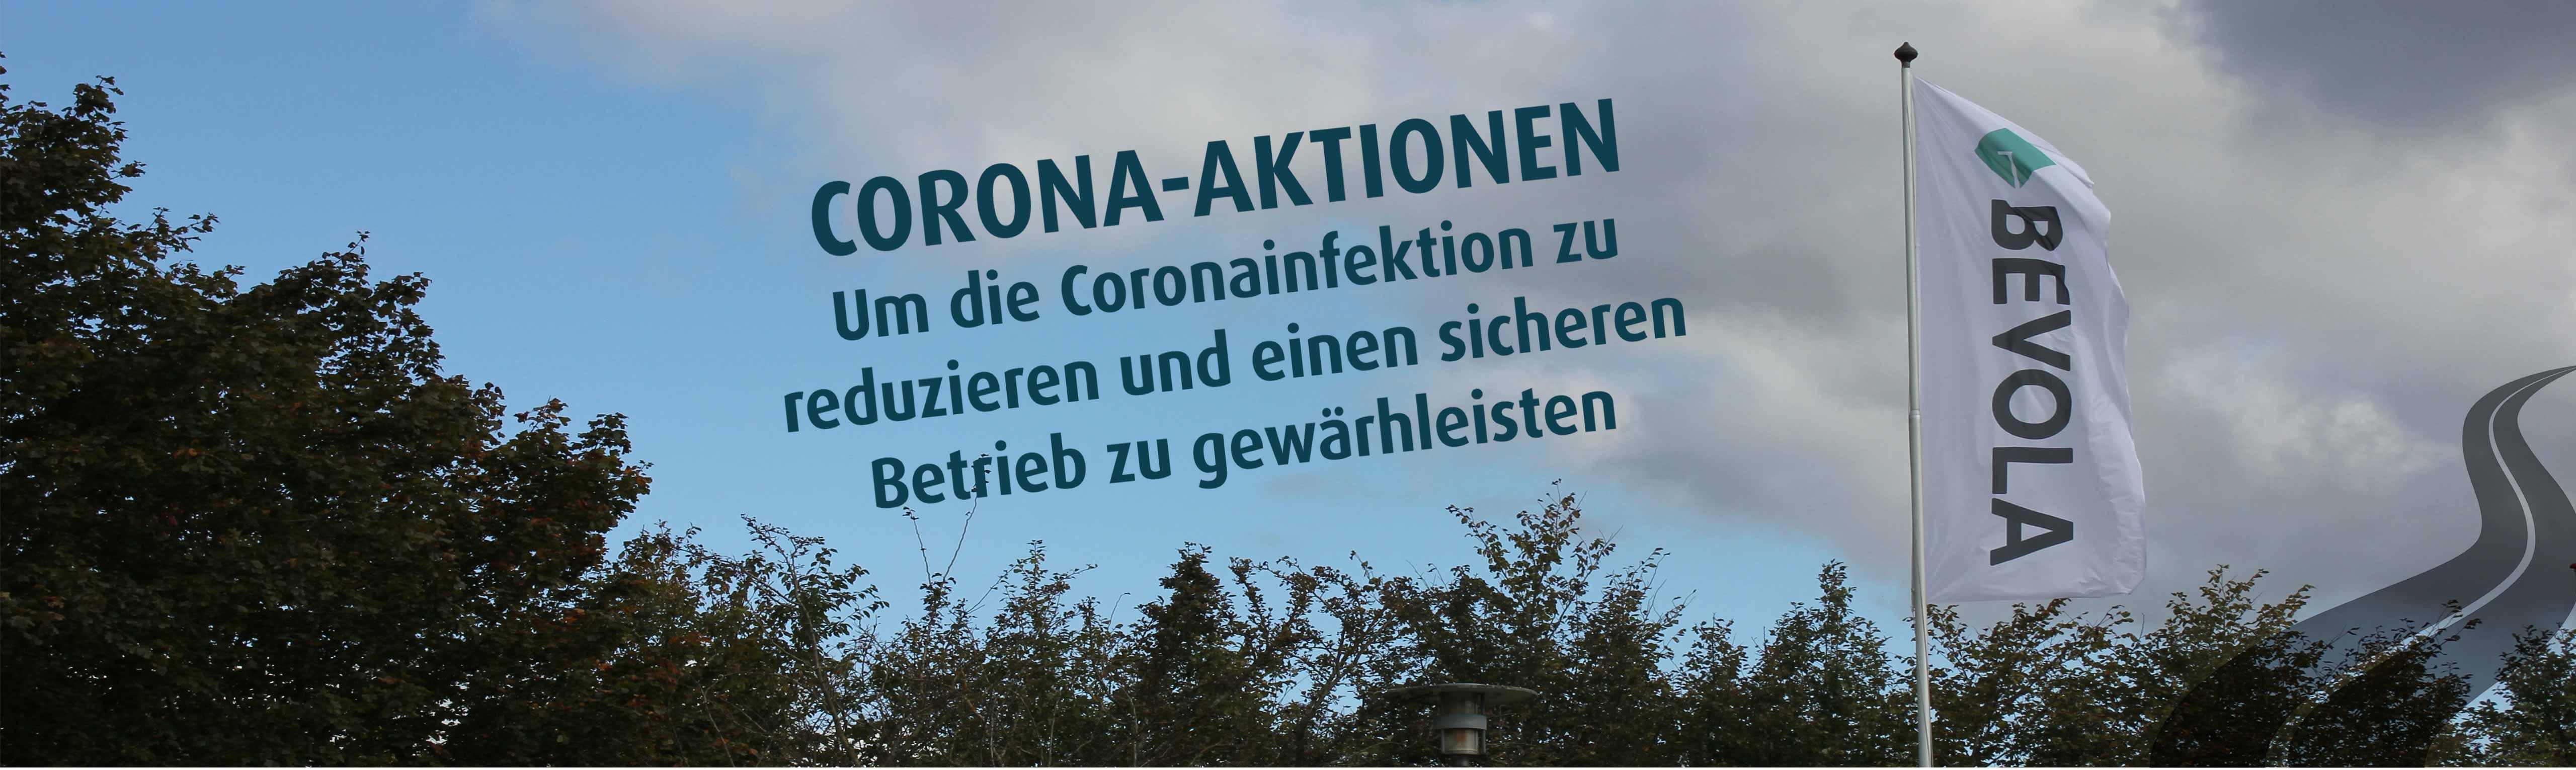 Corona-Aktionen